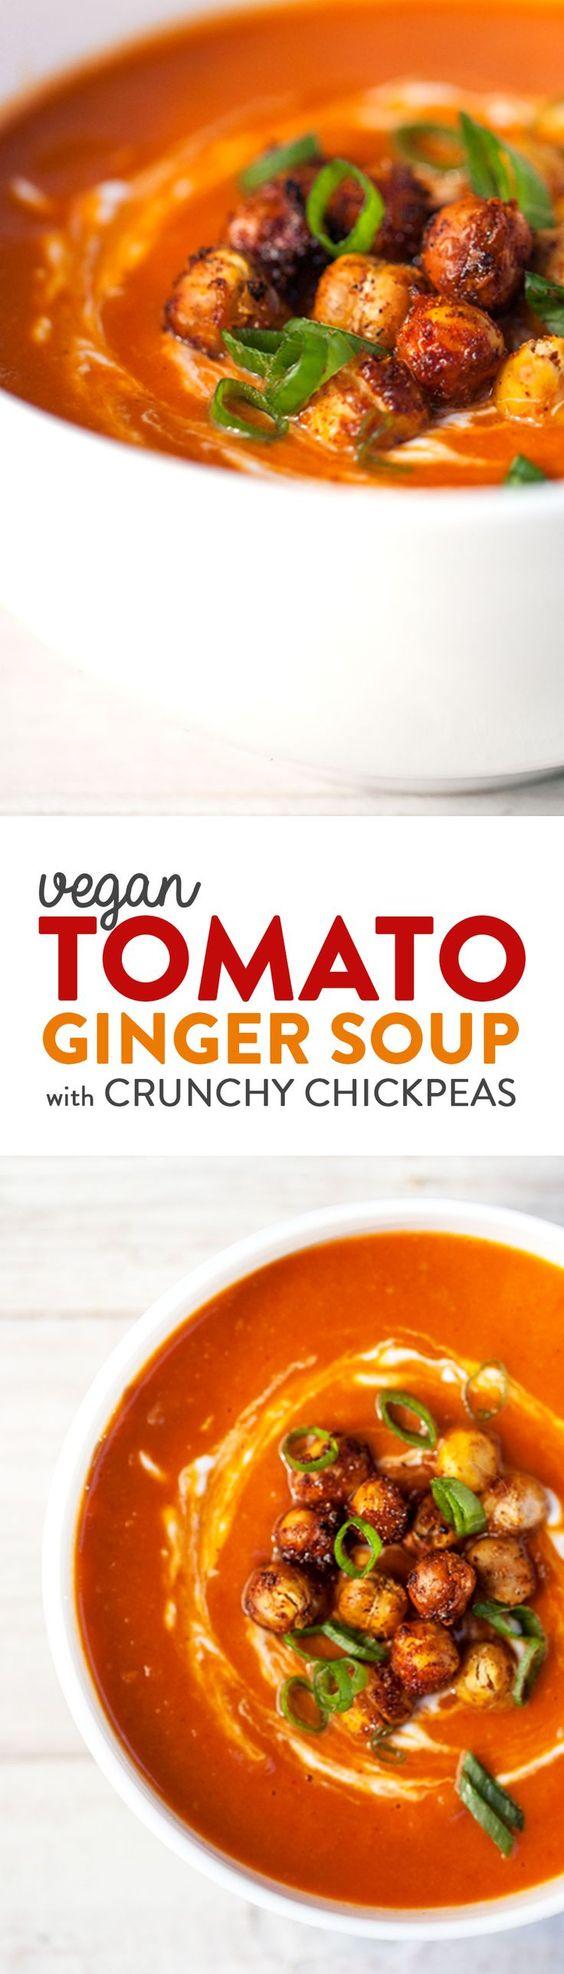 Creamy tomato soups, Tomato soups and Chickpeas on Pinterest